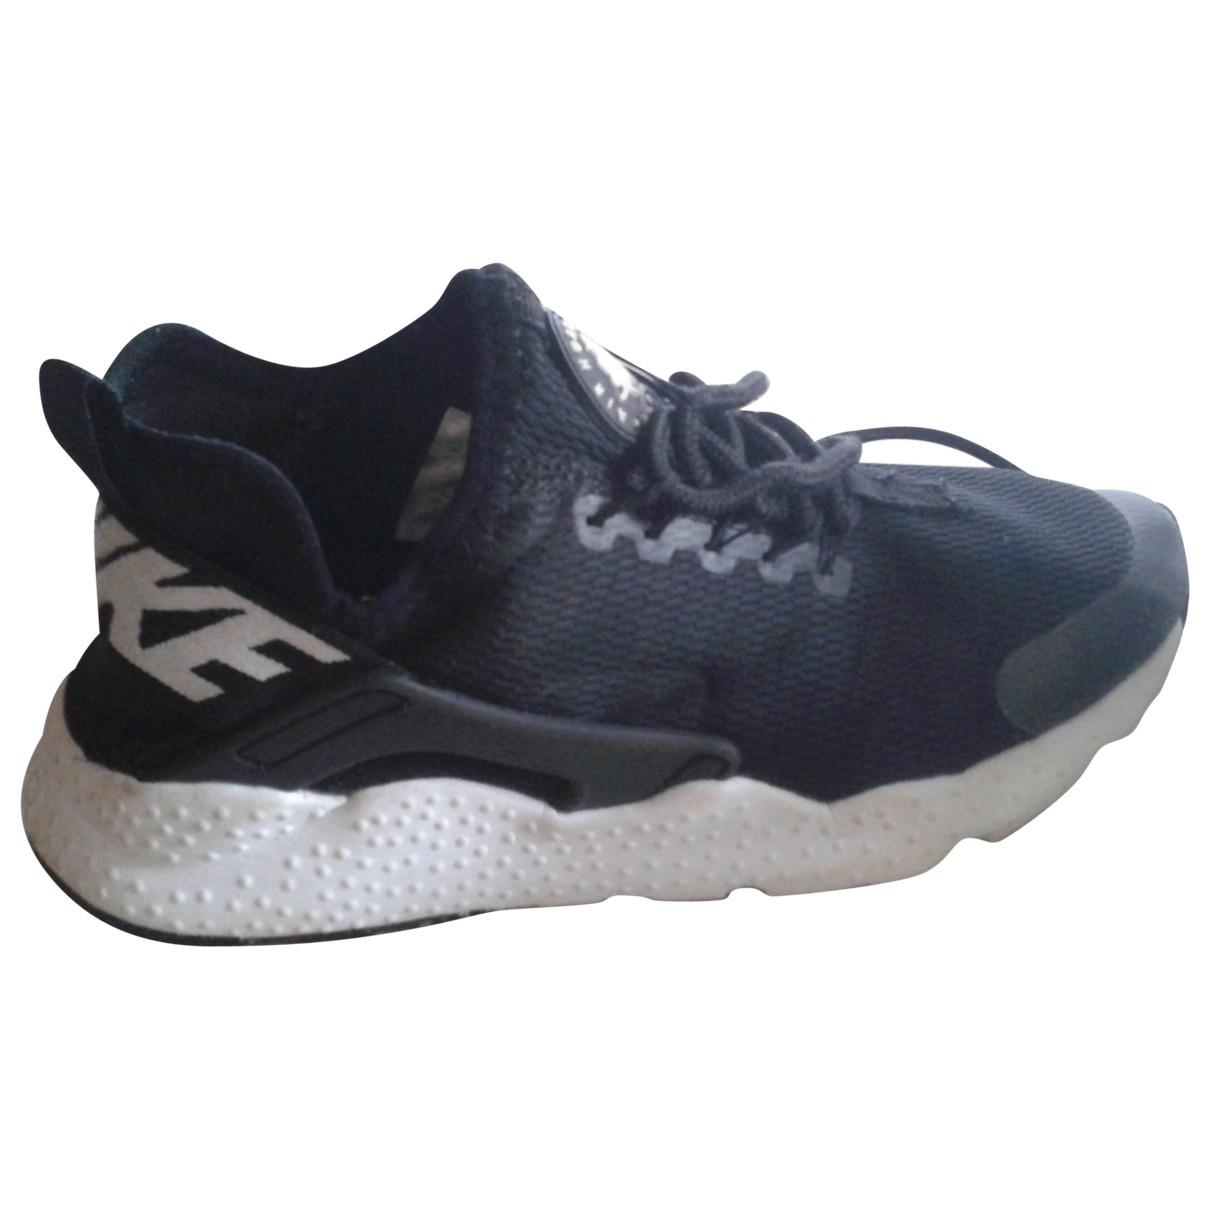 Baskets Huarache en Toile Noir Toile Nike en coloris Noir 3TNk